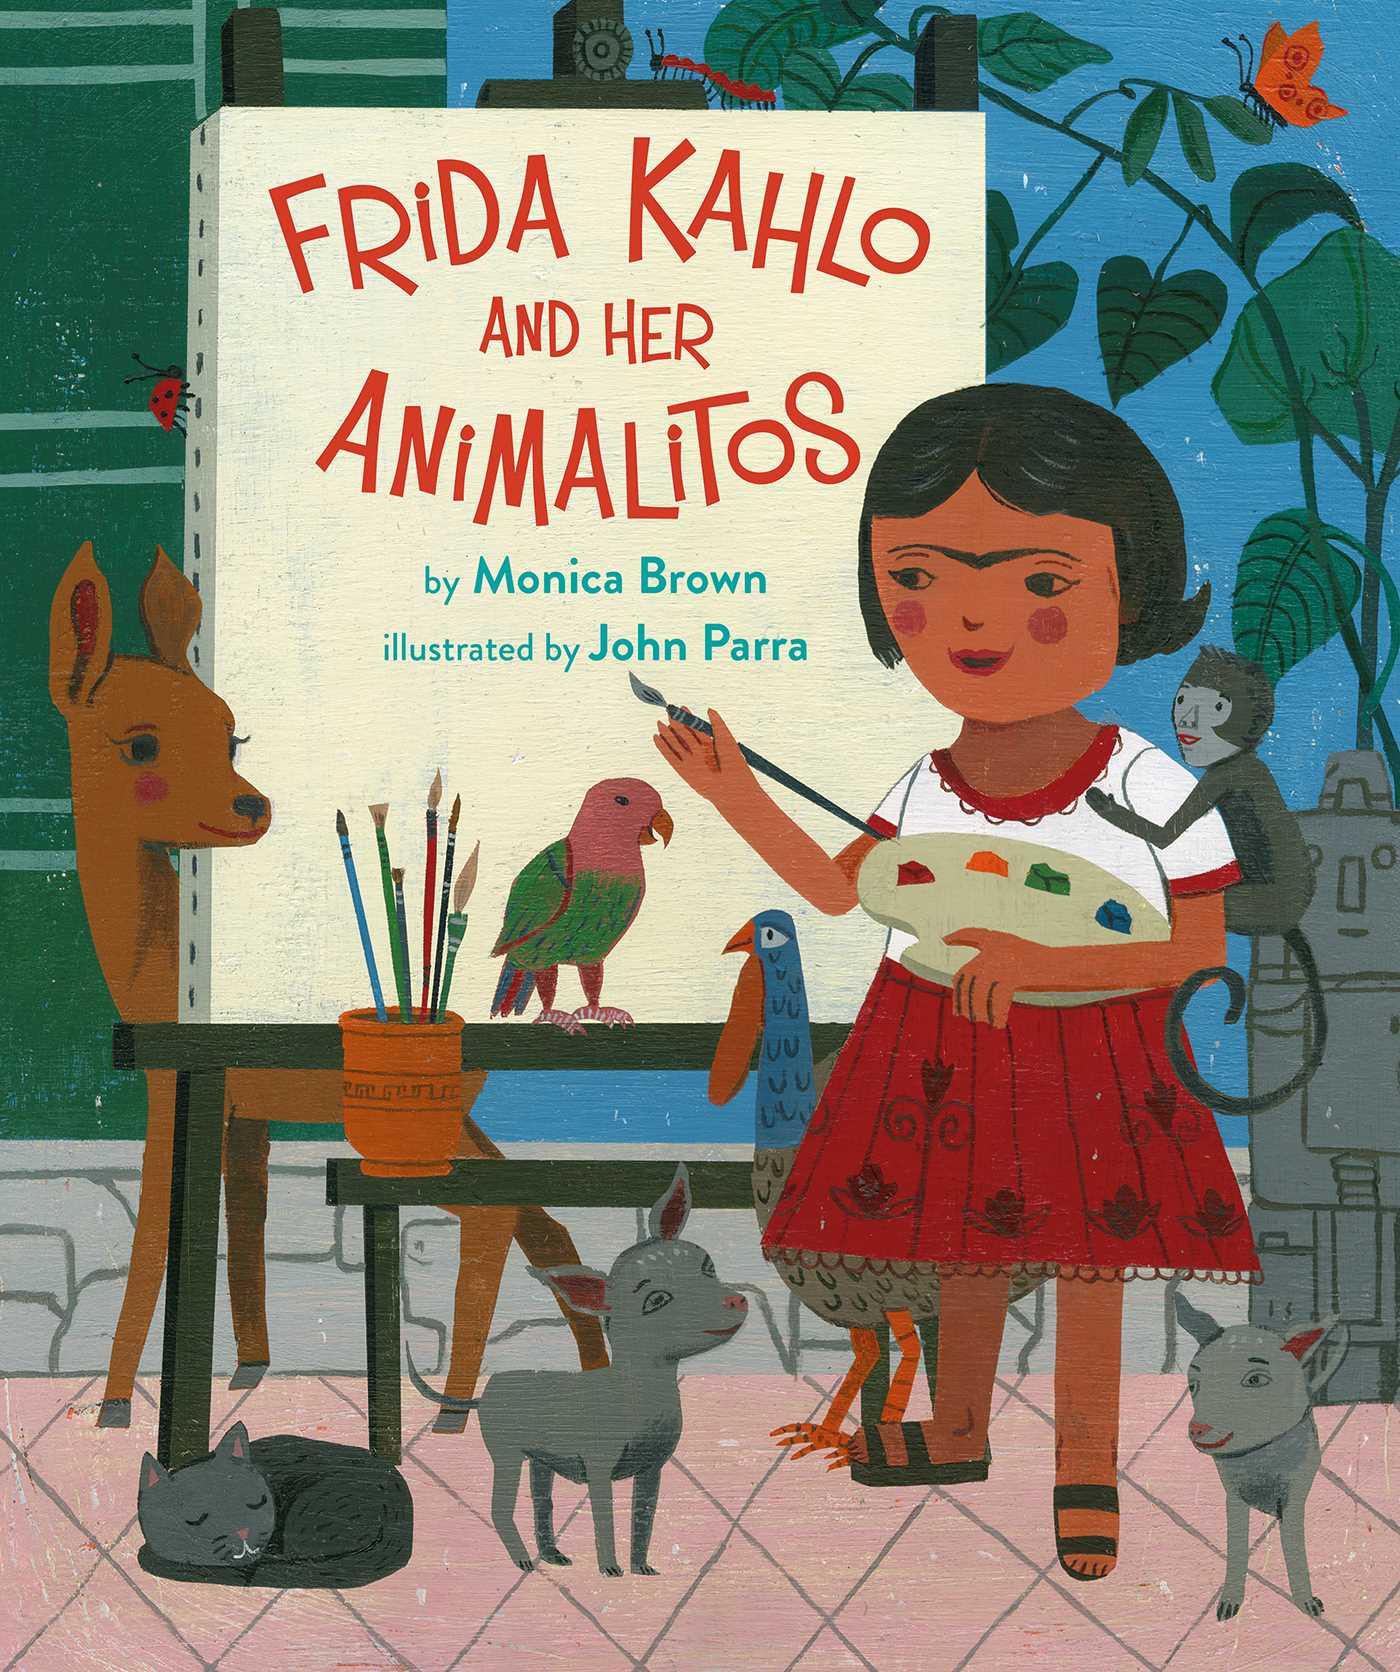 Sunday Story Time with John Parra (Illustrator of Frida Kahlo and Her Animalitos)